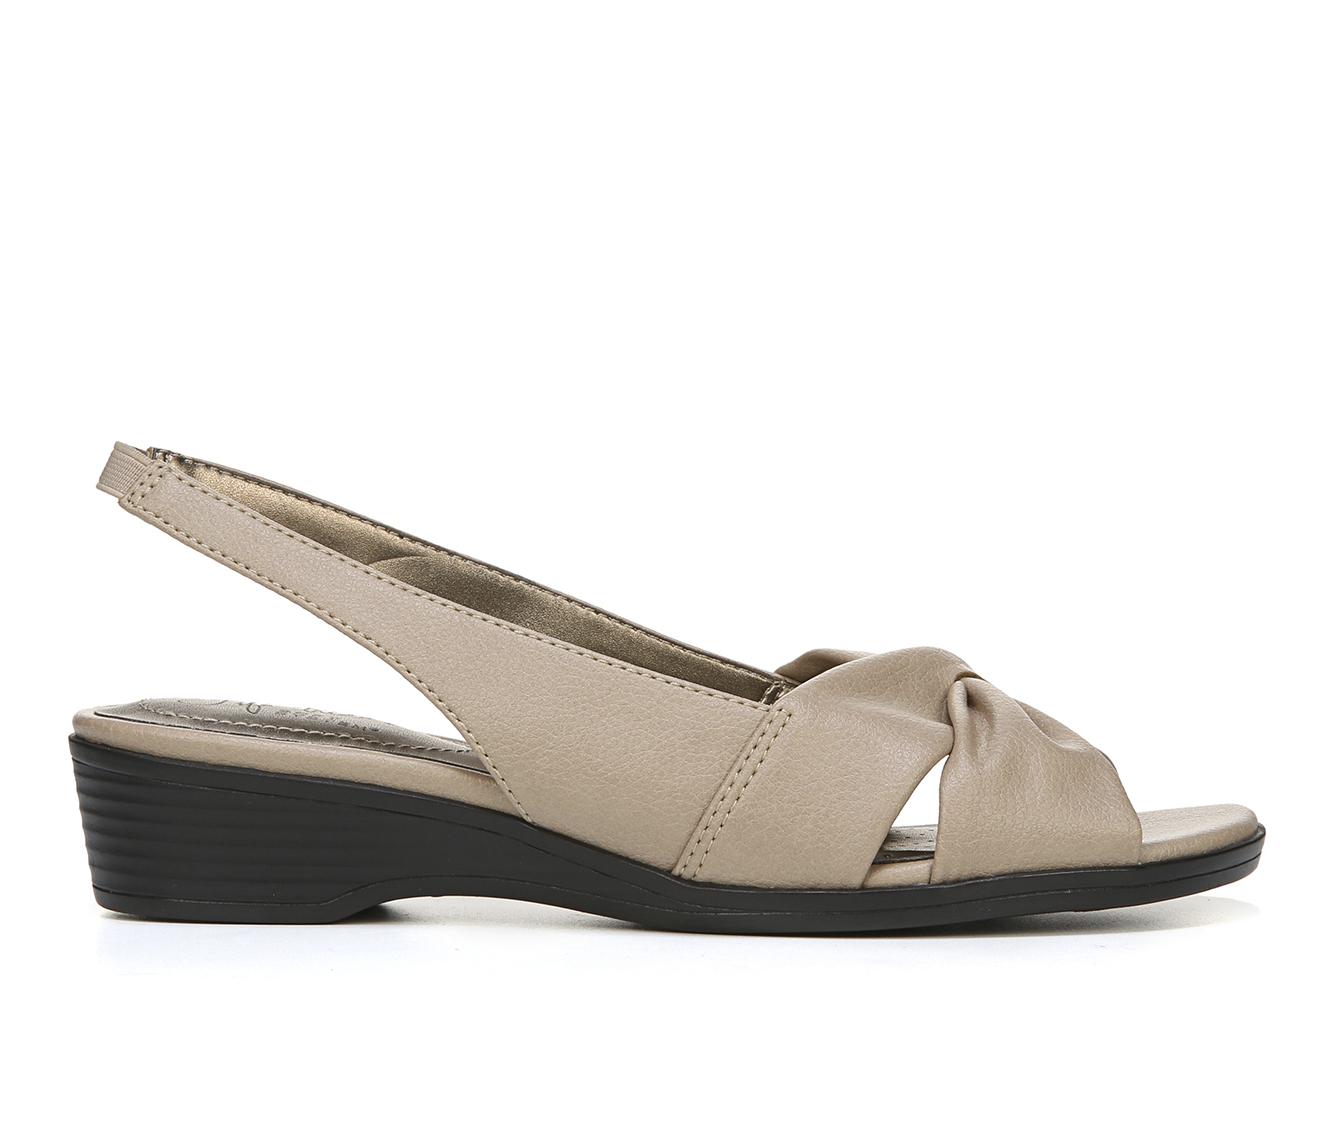 LifeStride Mimosa 2 Women's Sandal (Beige Faux Leather)